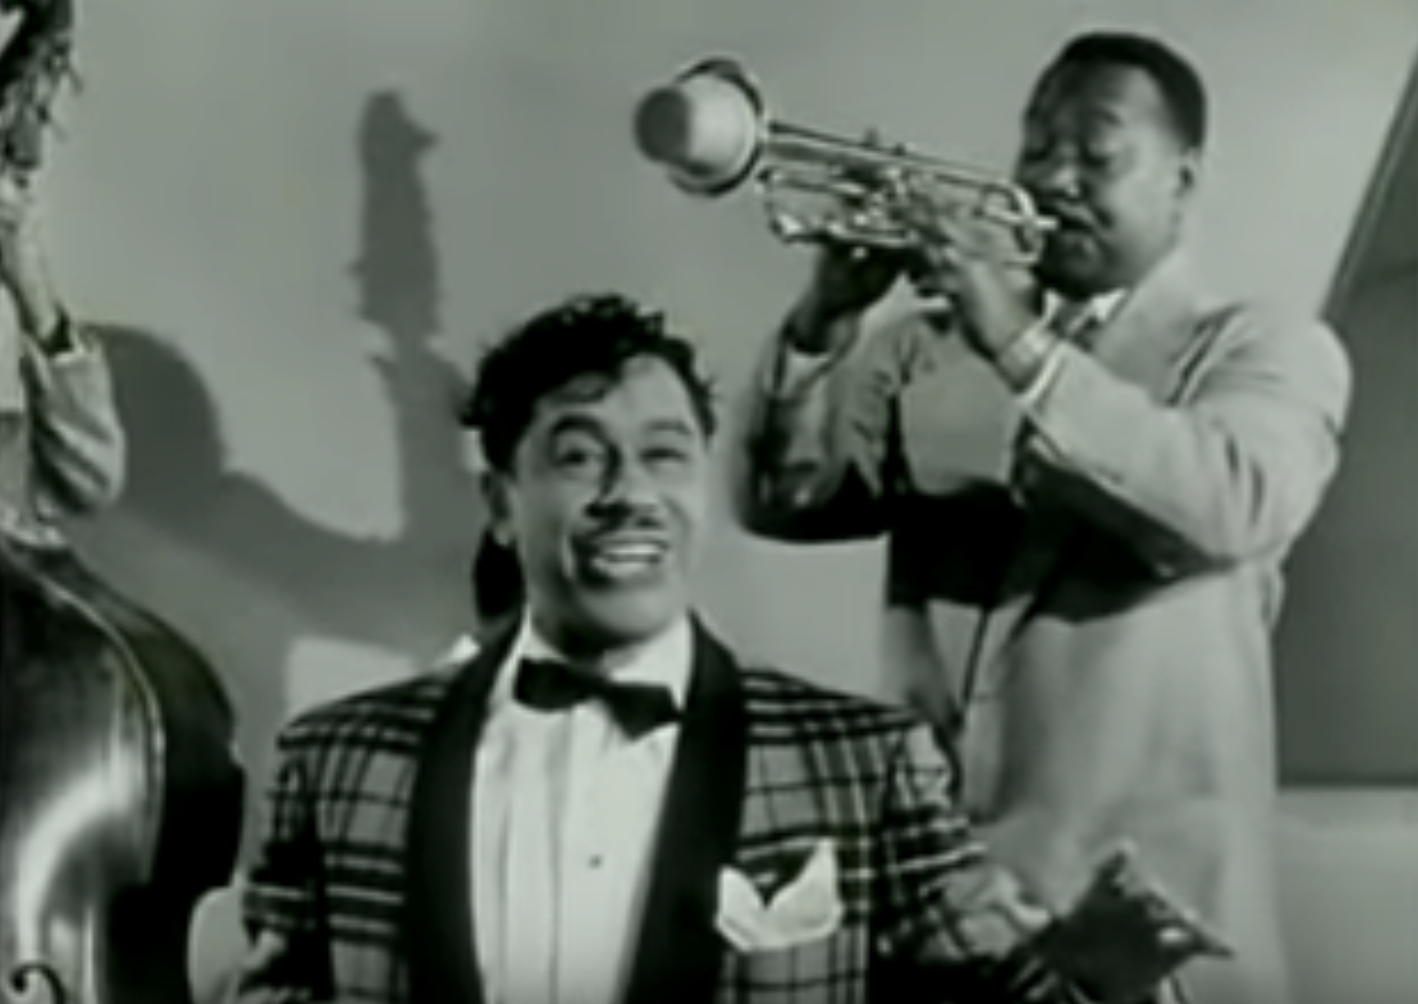 Cab Calloway: Minnie the Moocher - 1950's